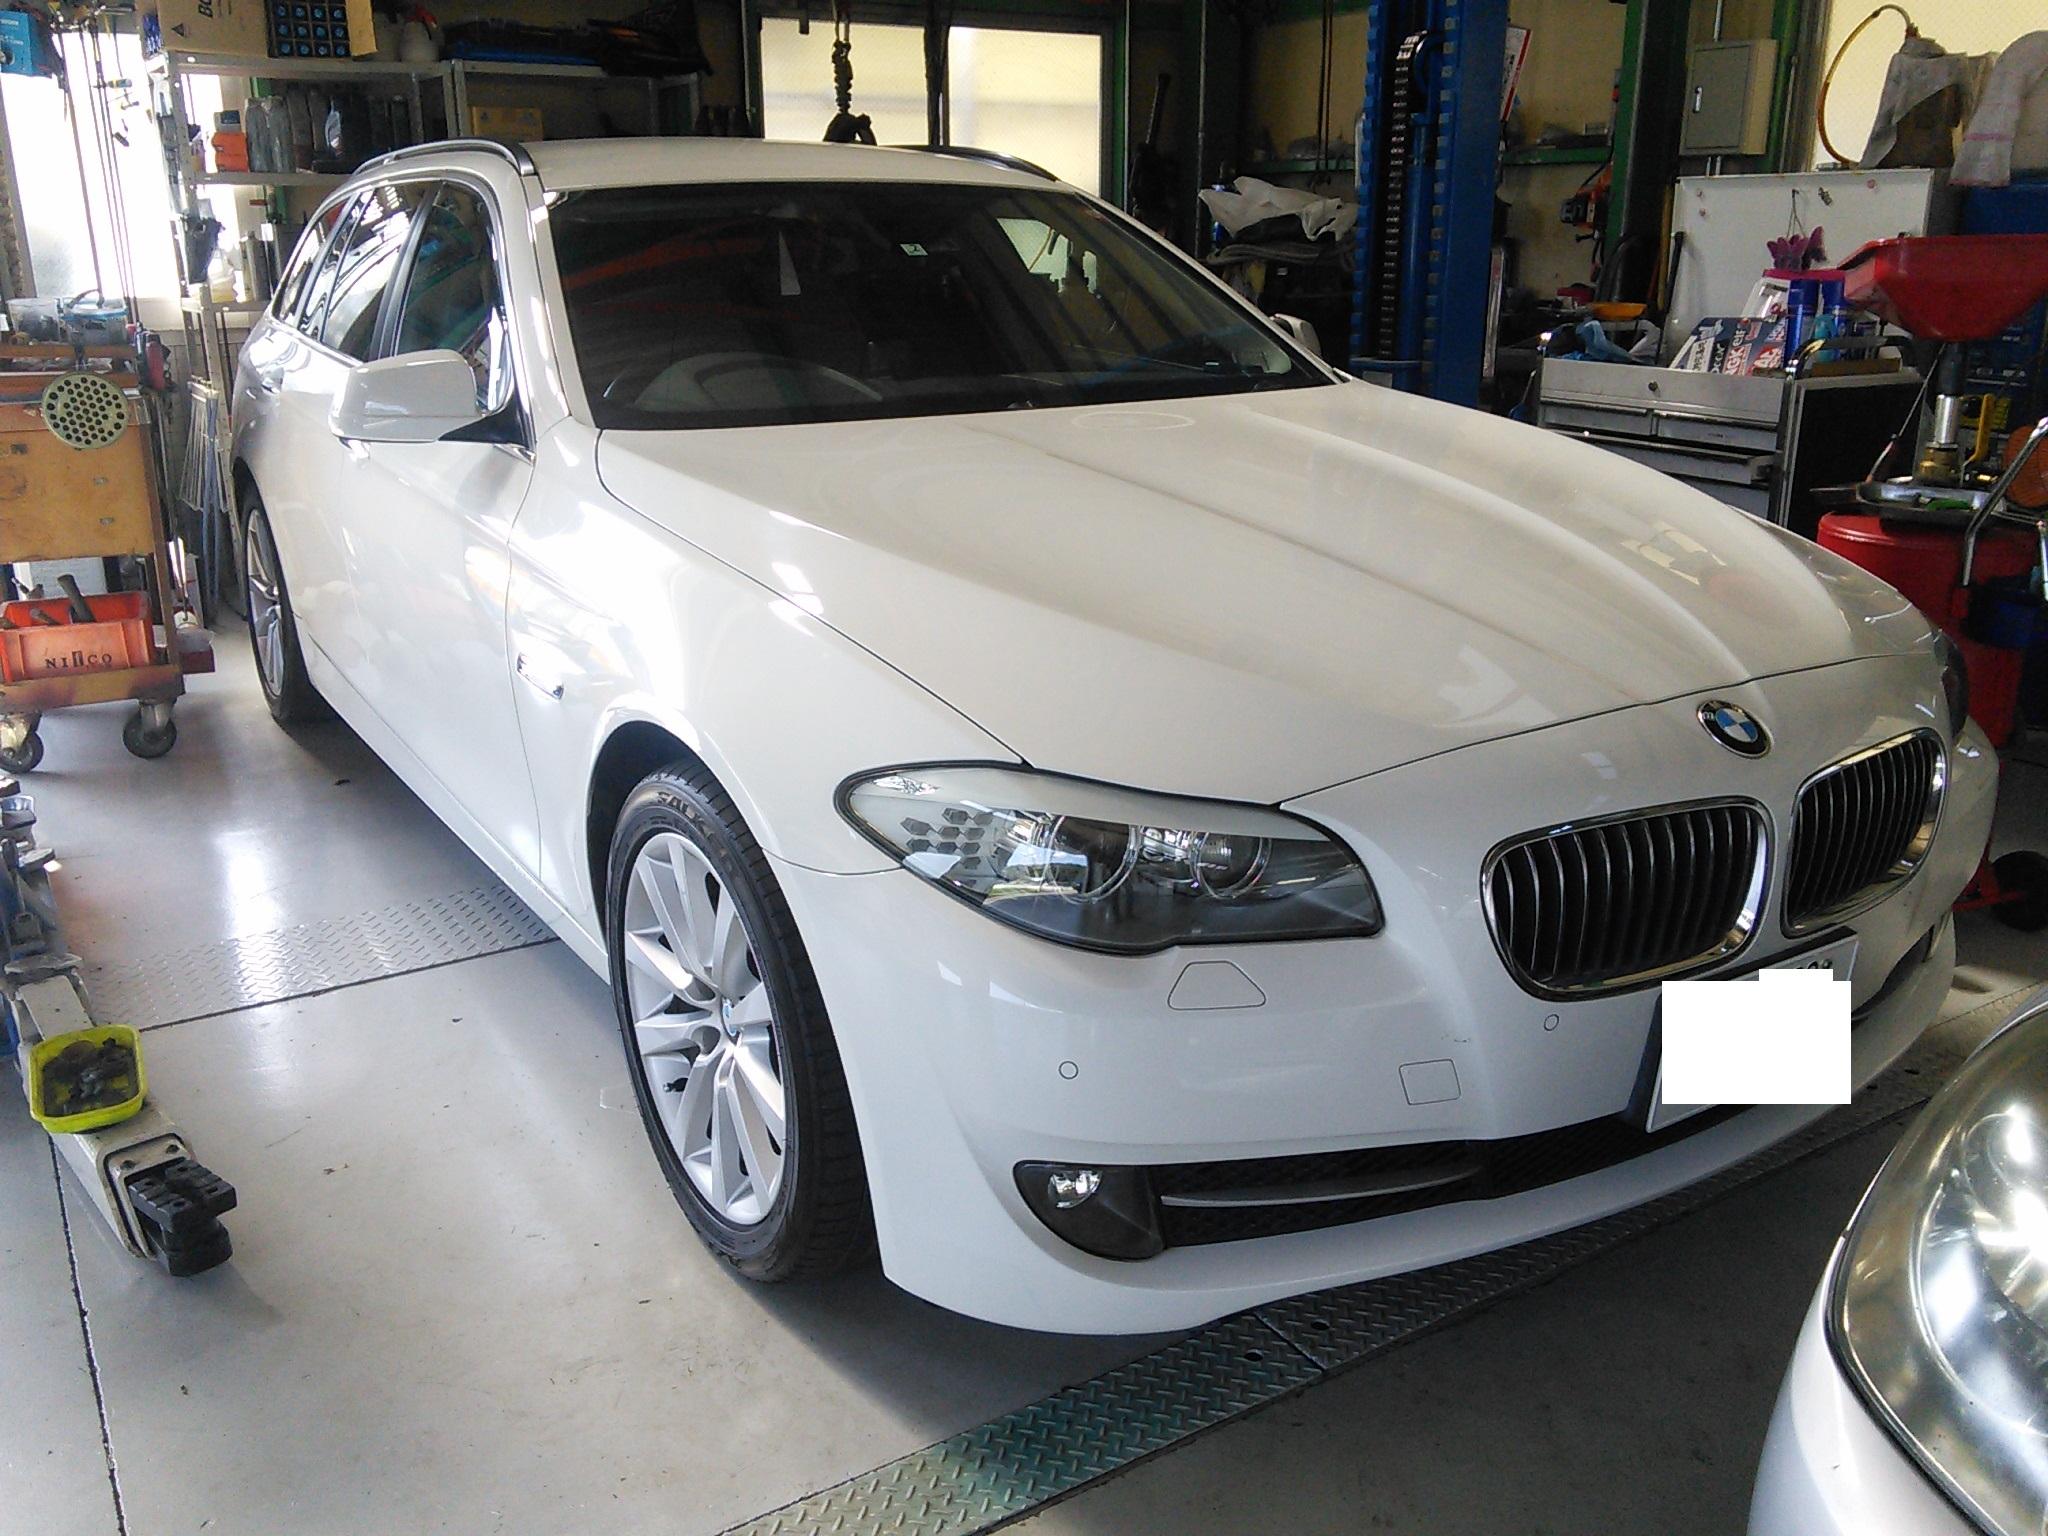 BMW F11 ブロアモーター異音する